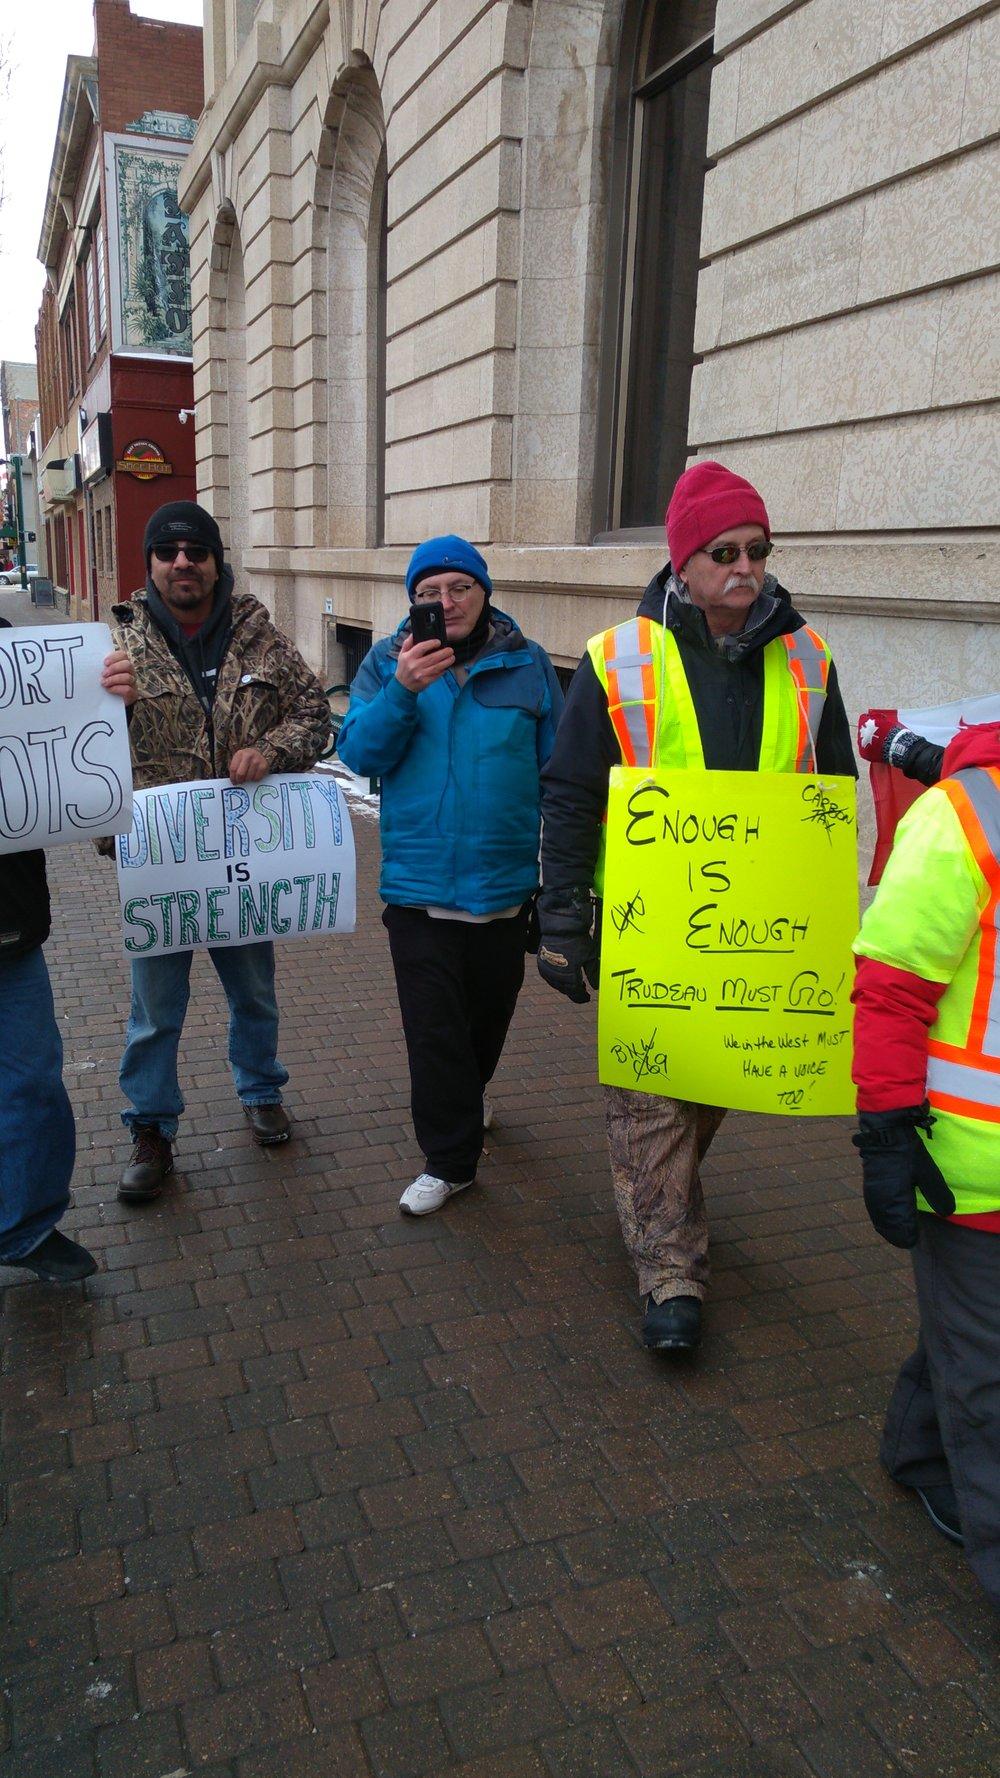 Protestors on both sides intermingled